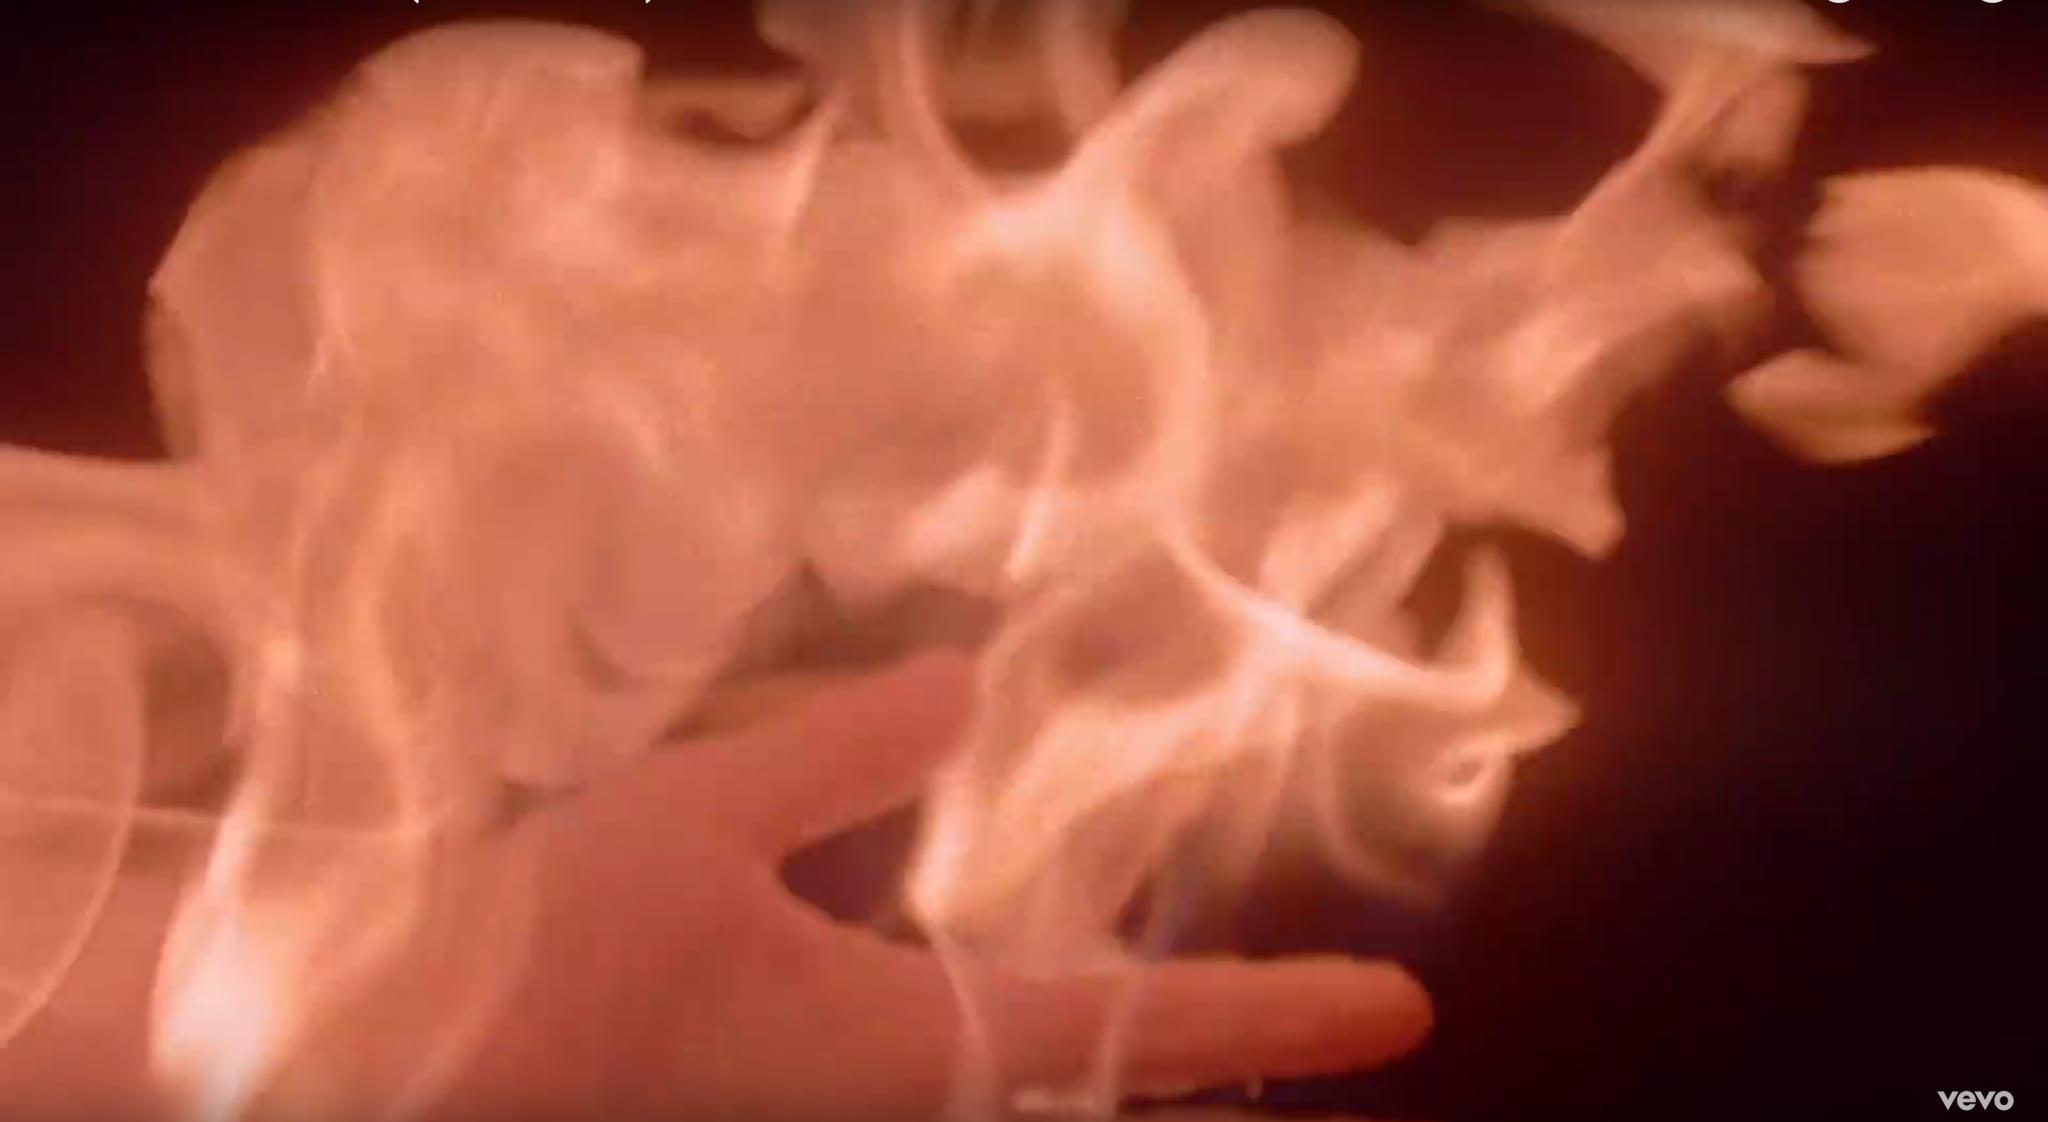 mg action, body-burn, feuerstunts deutschland, naked skin burn, body burn berlin,